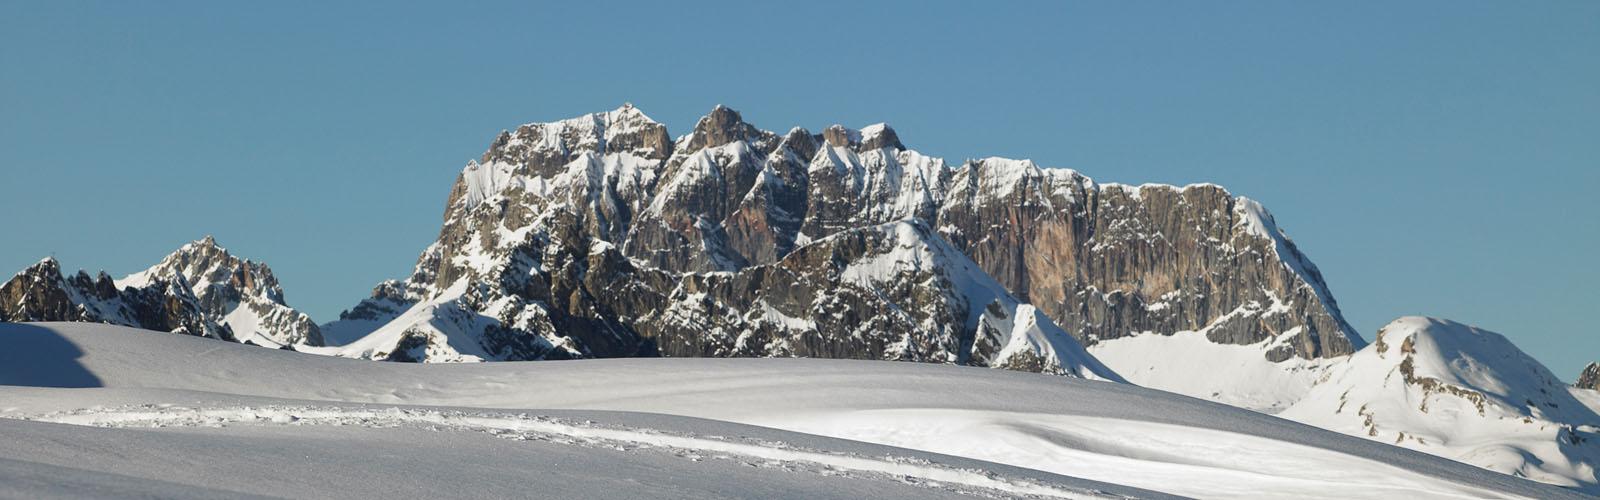 Sport Milanovic - Winterurlaub am Arlberg